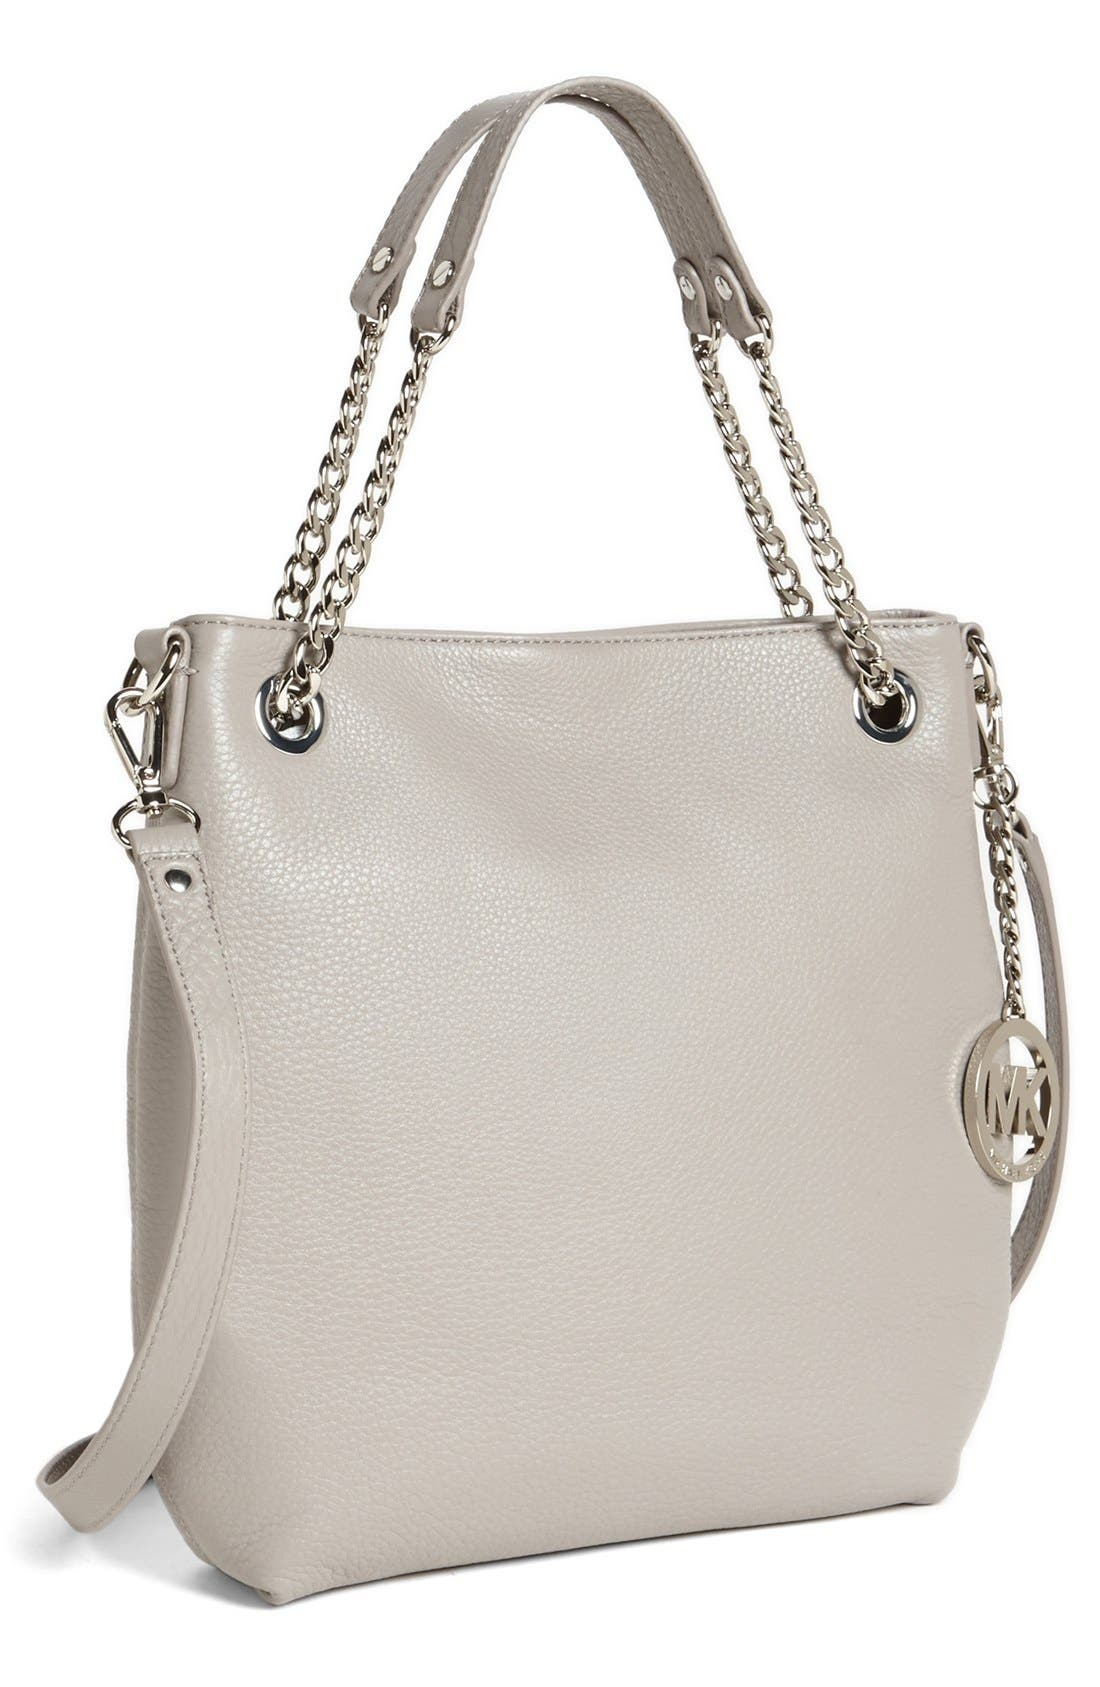 Main Image - MICHAEL Michael Kors 'Jet Set Chain - Medium' Leather Convertible Shoulder Bag